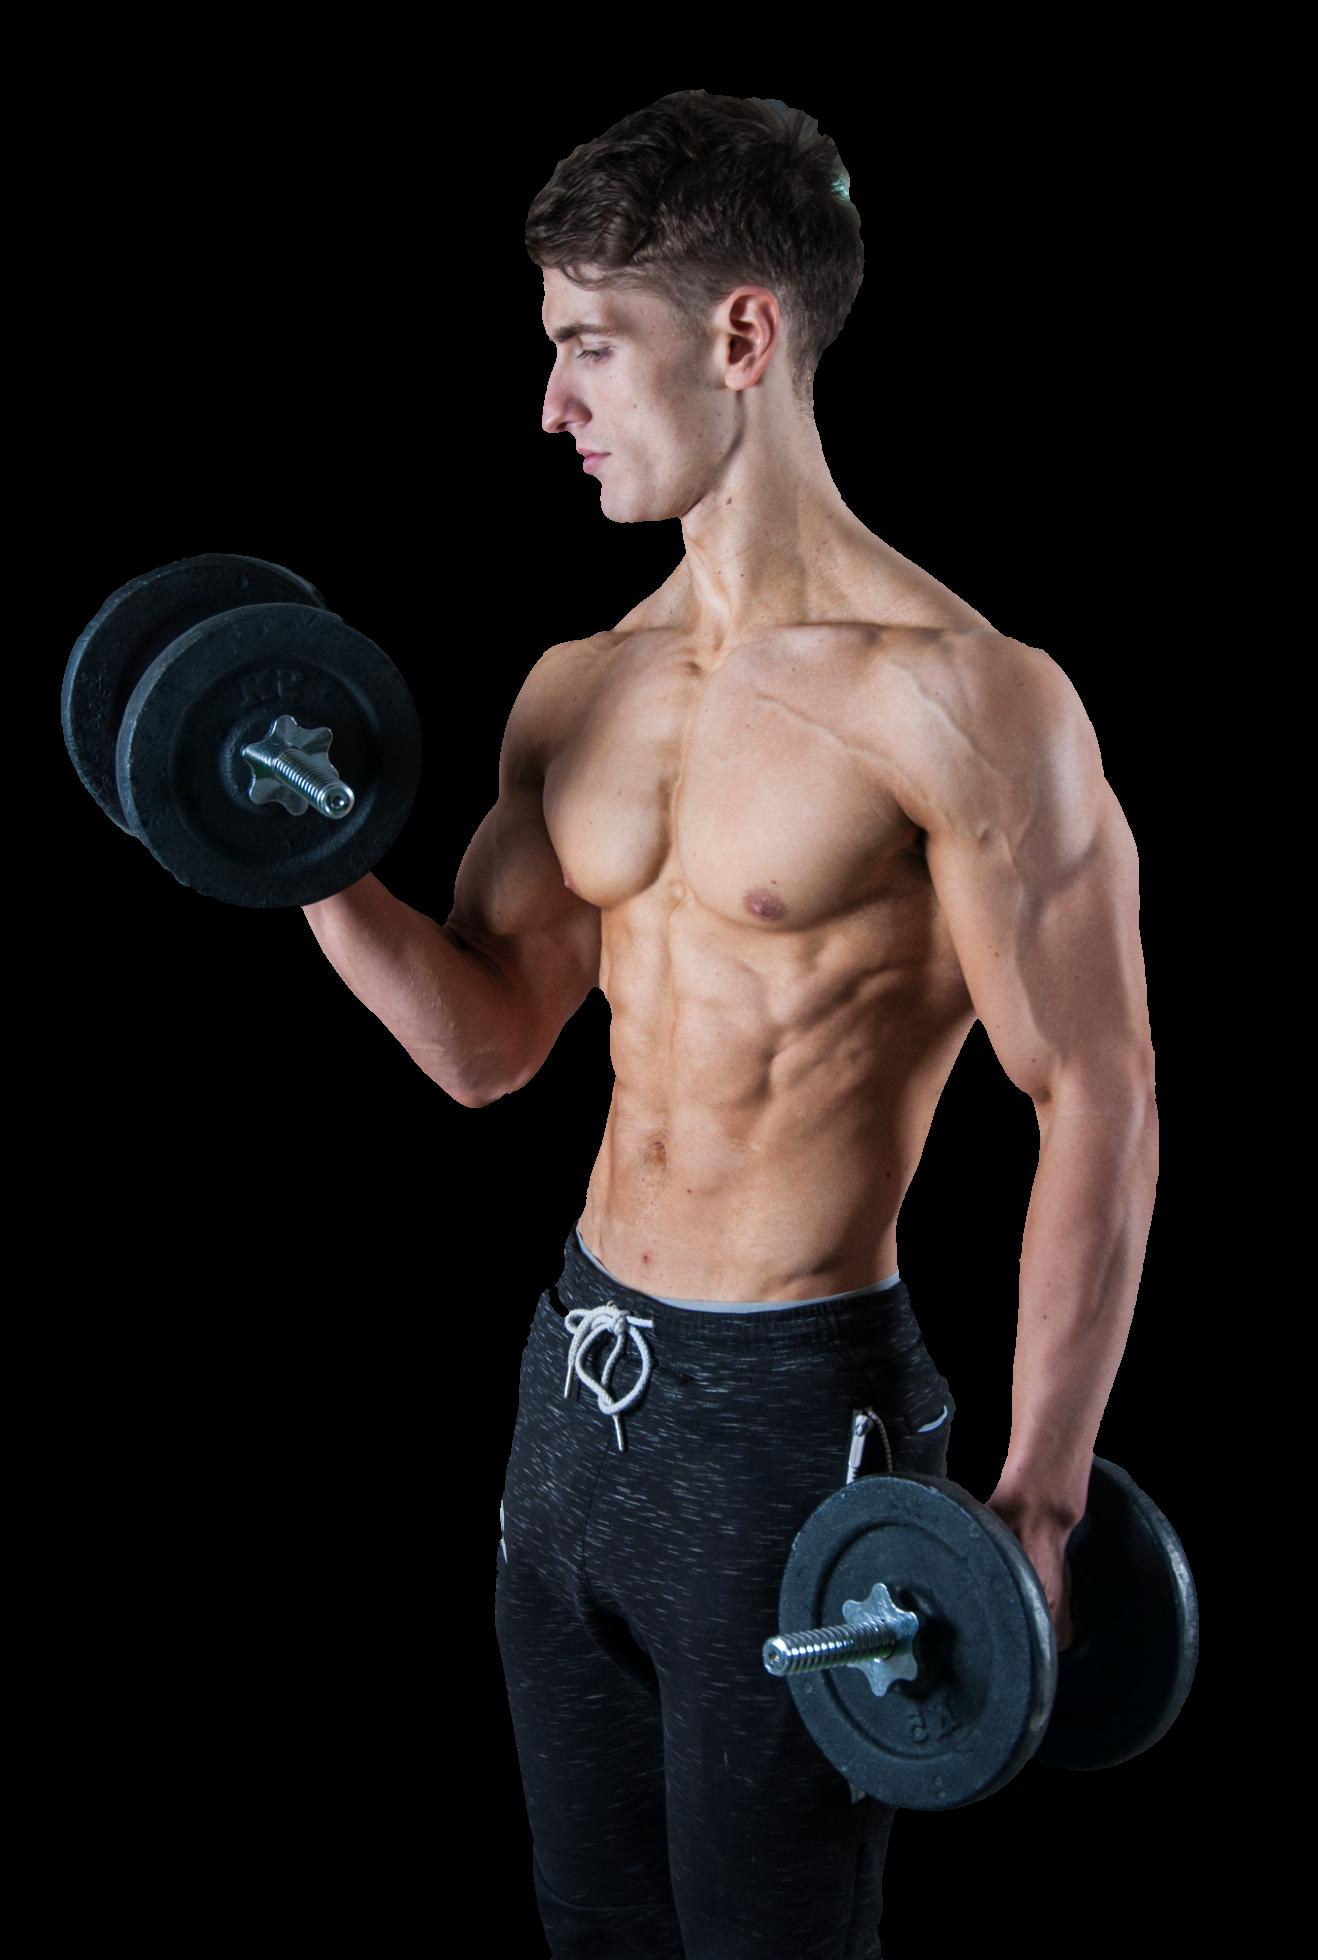 Mann, Körper, definierte Muskeln